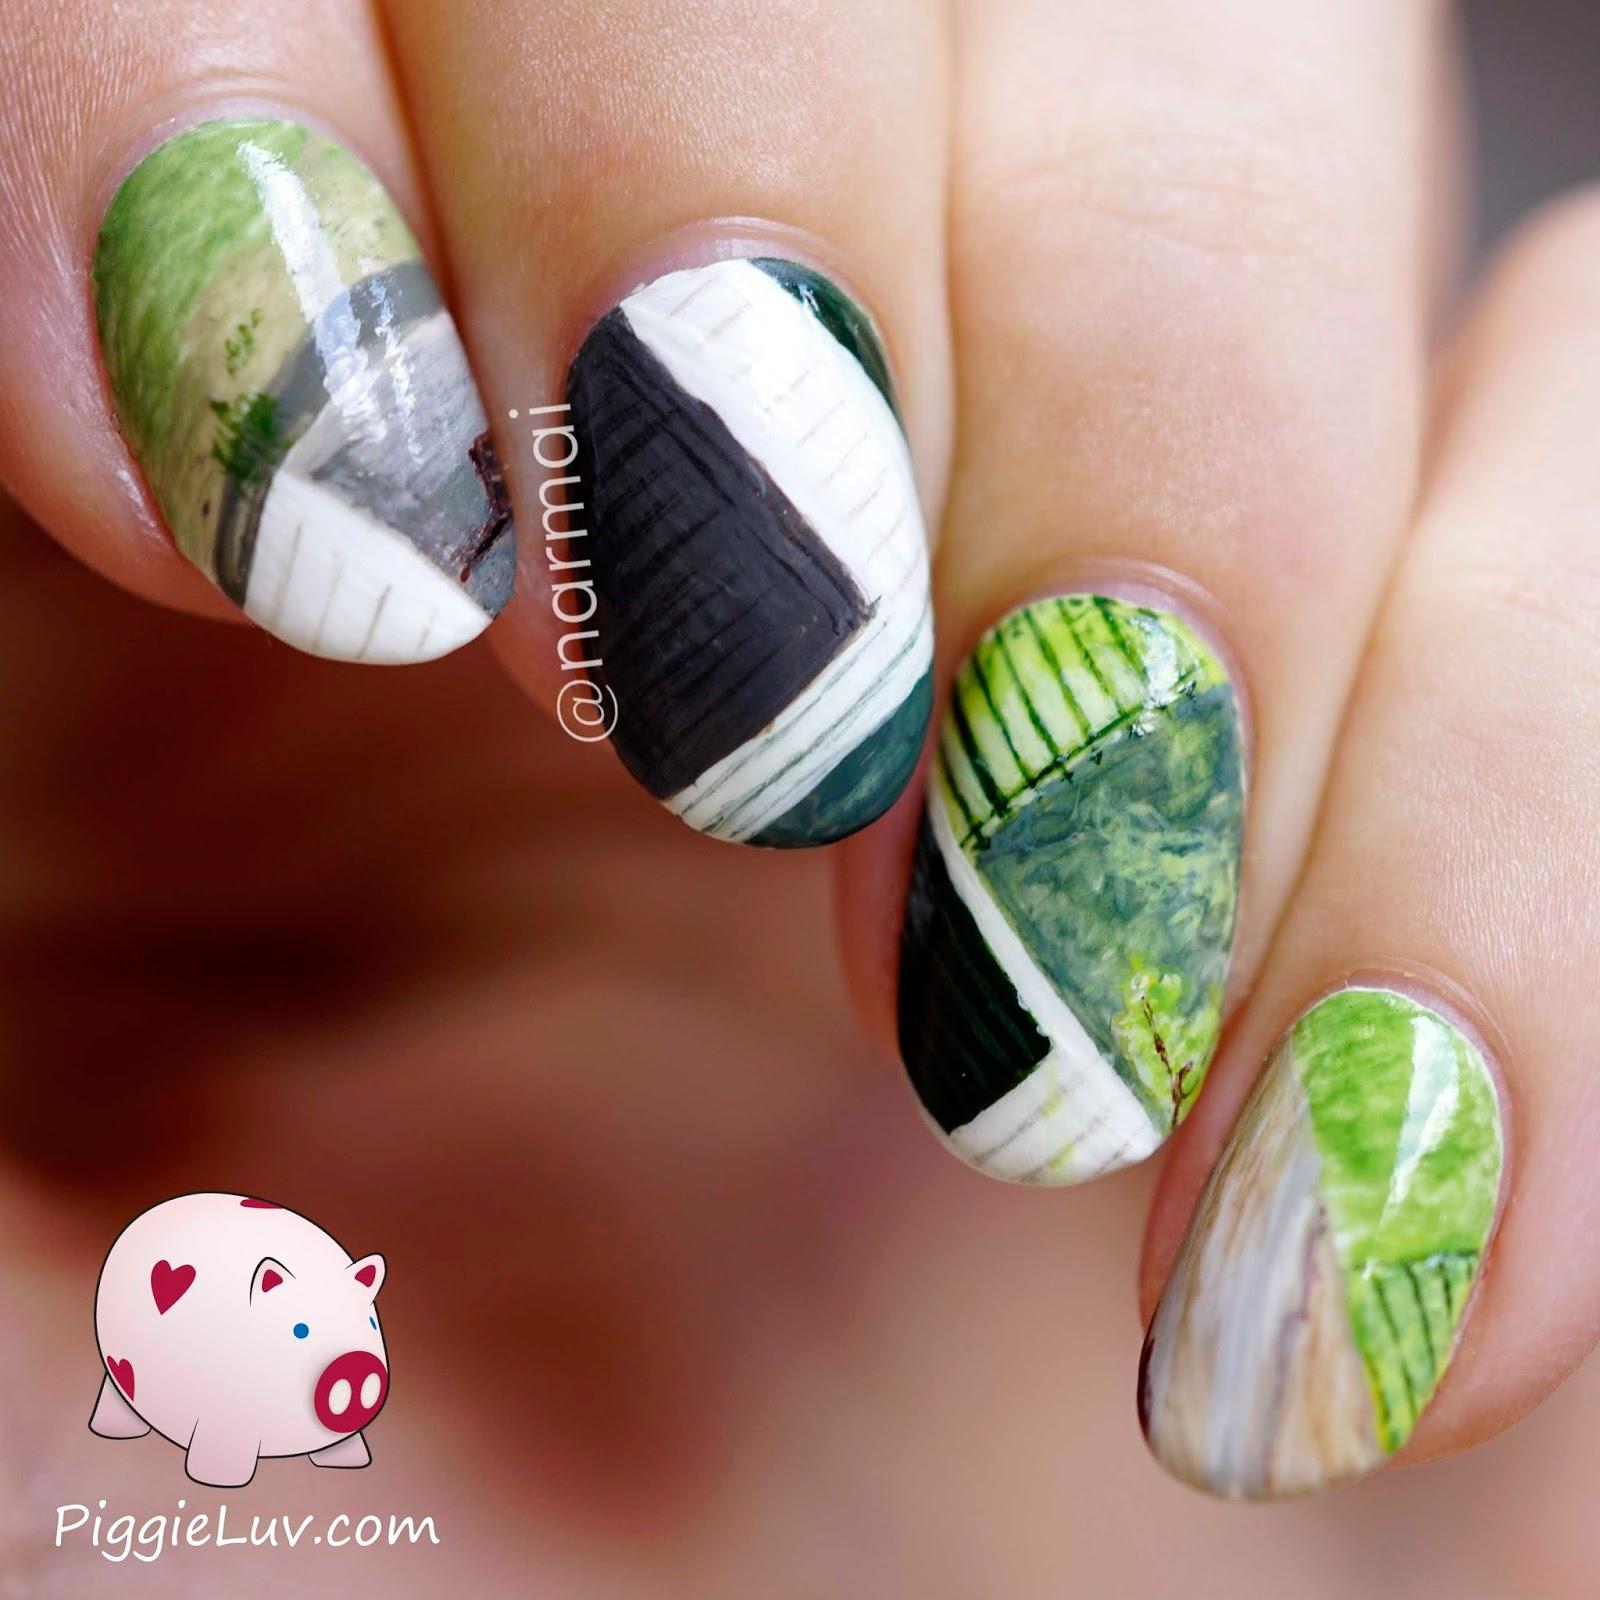 PiggieLuv: Extreme camouflage nail art